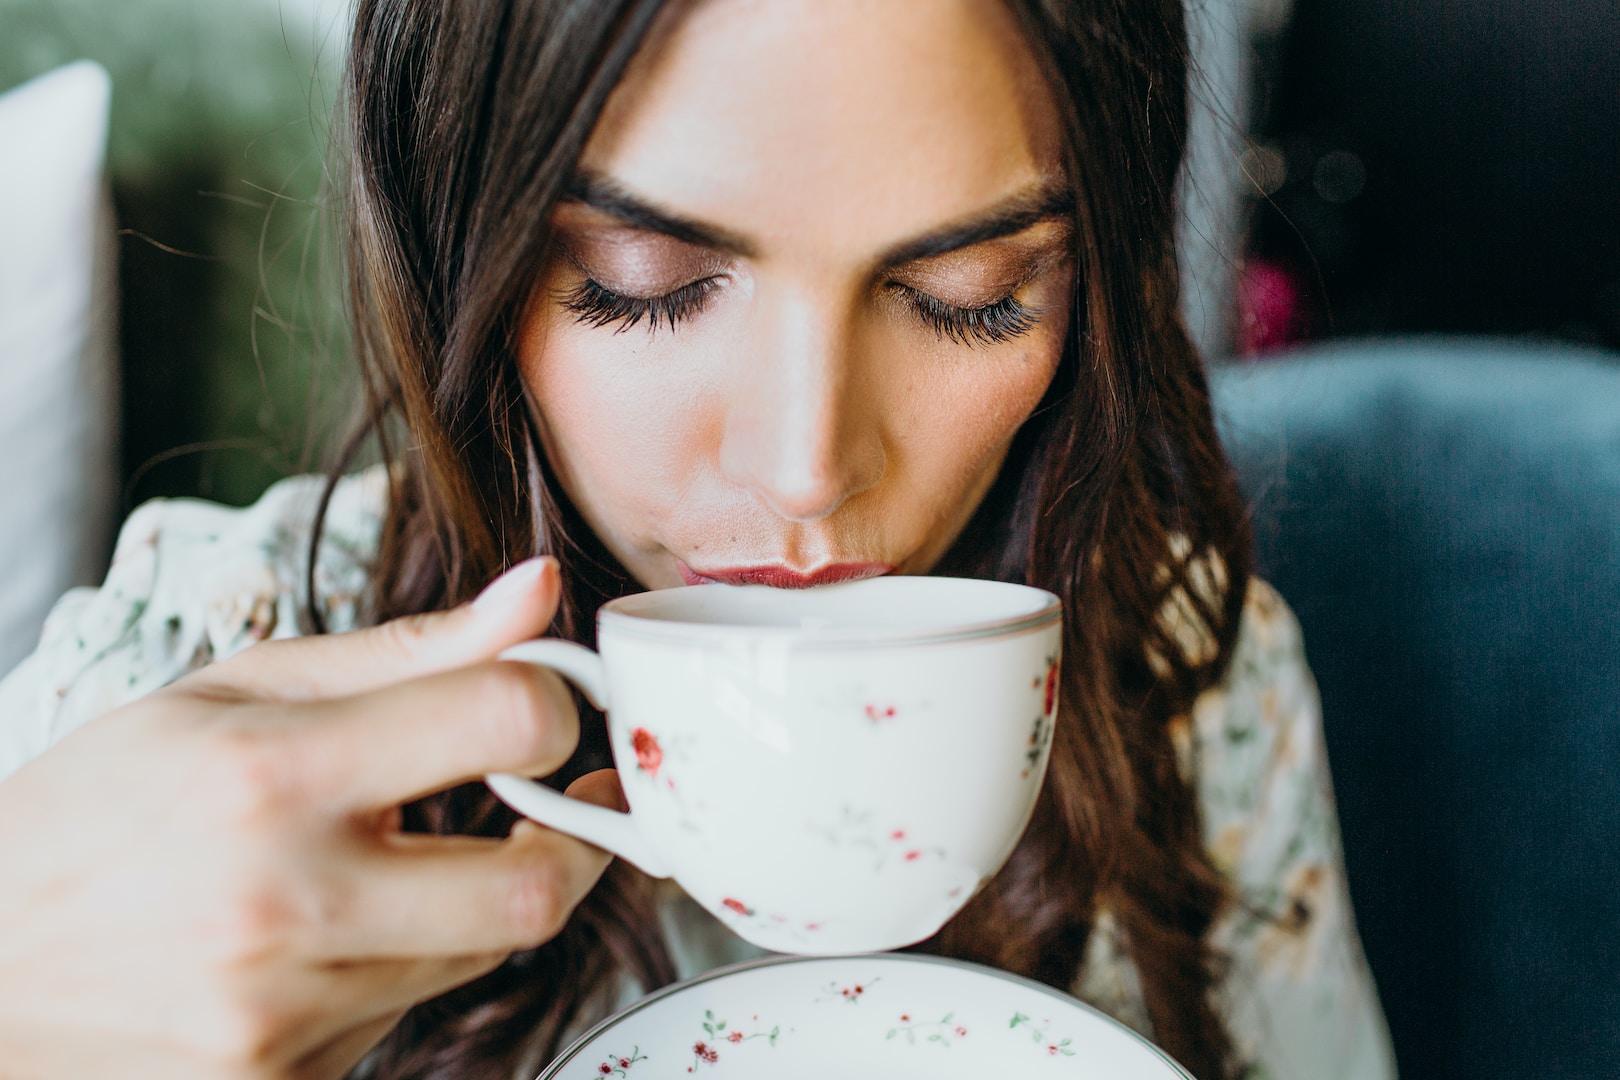 woman sippling from mug